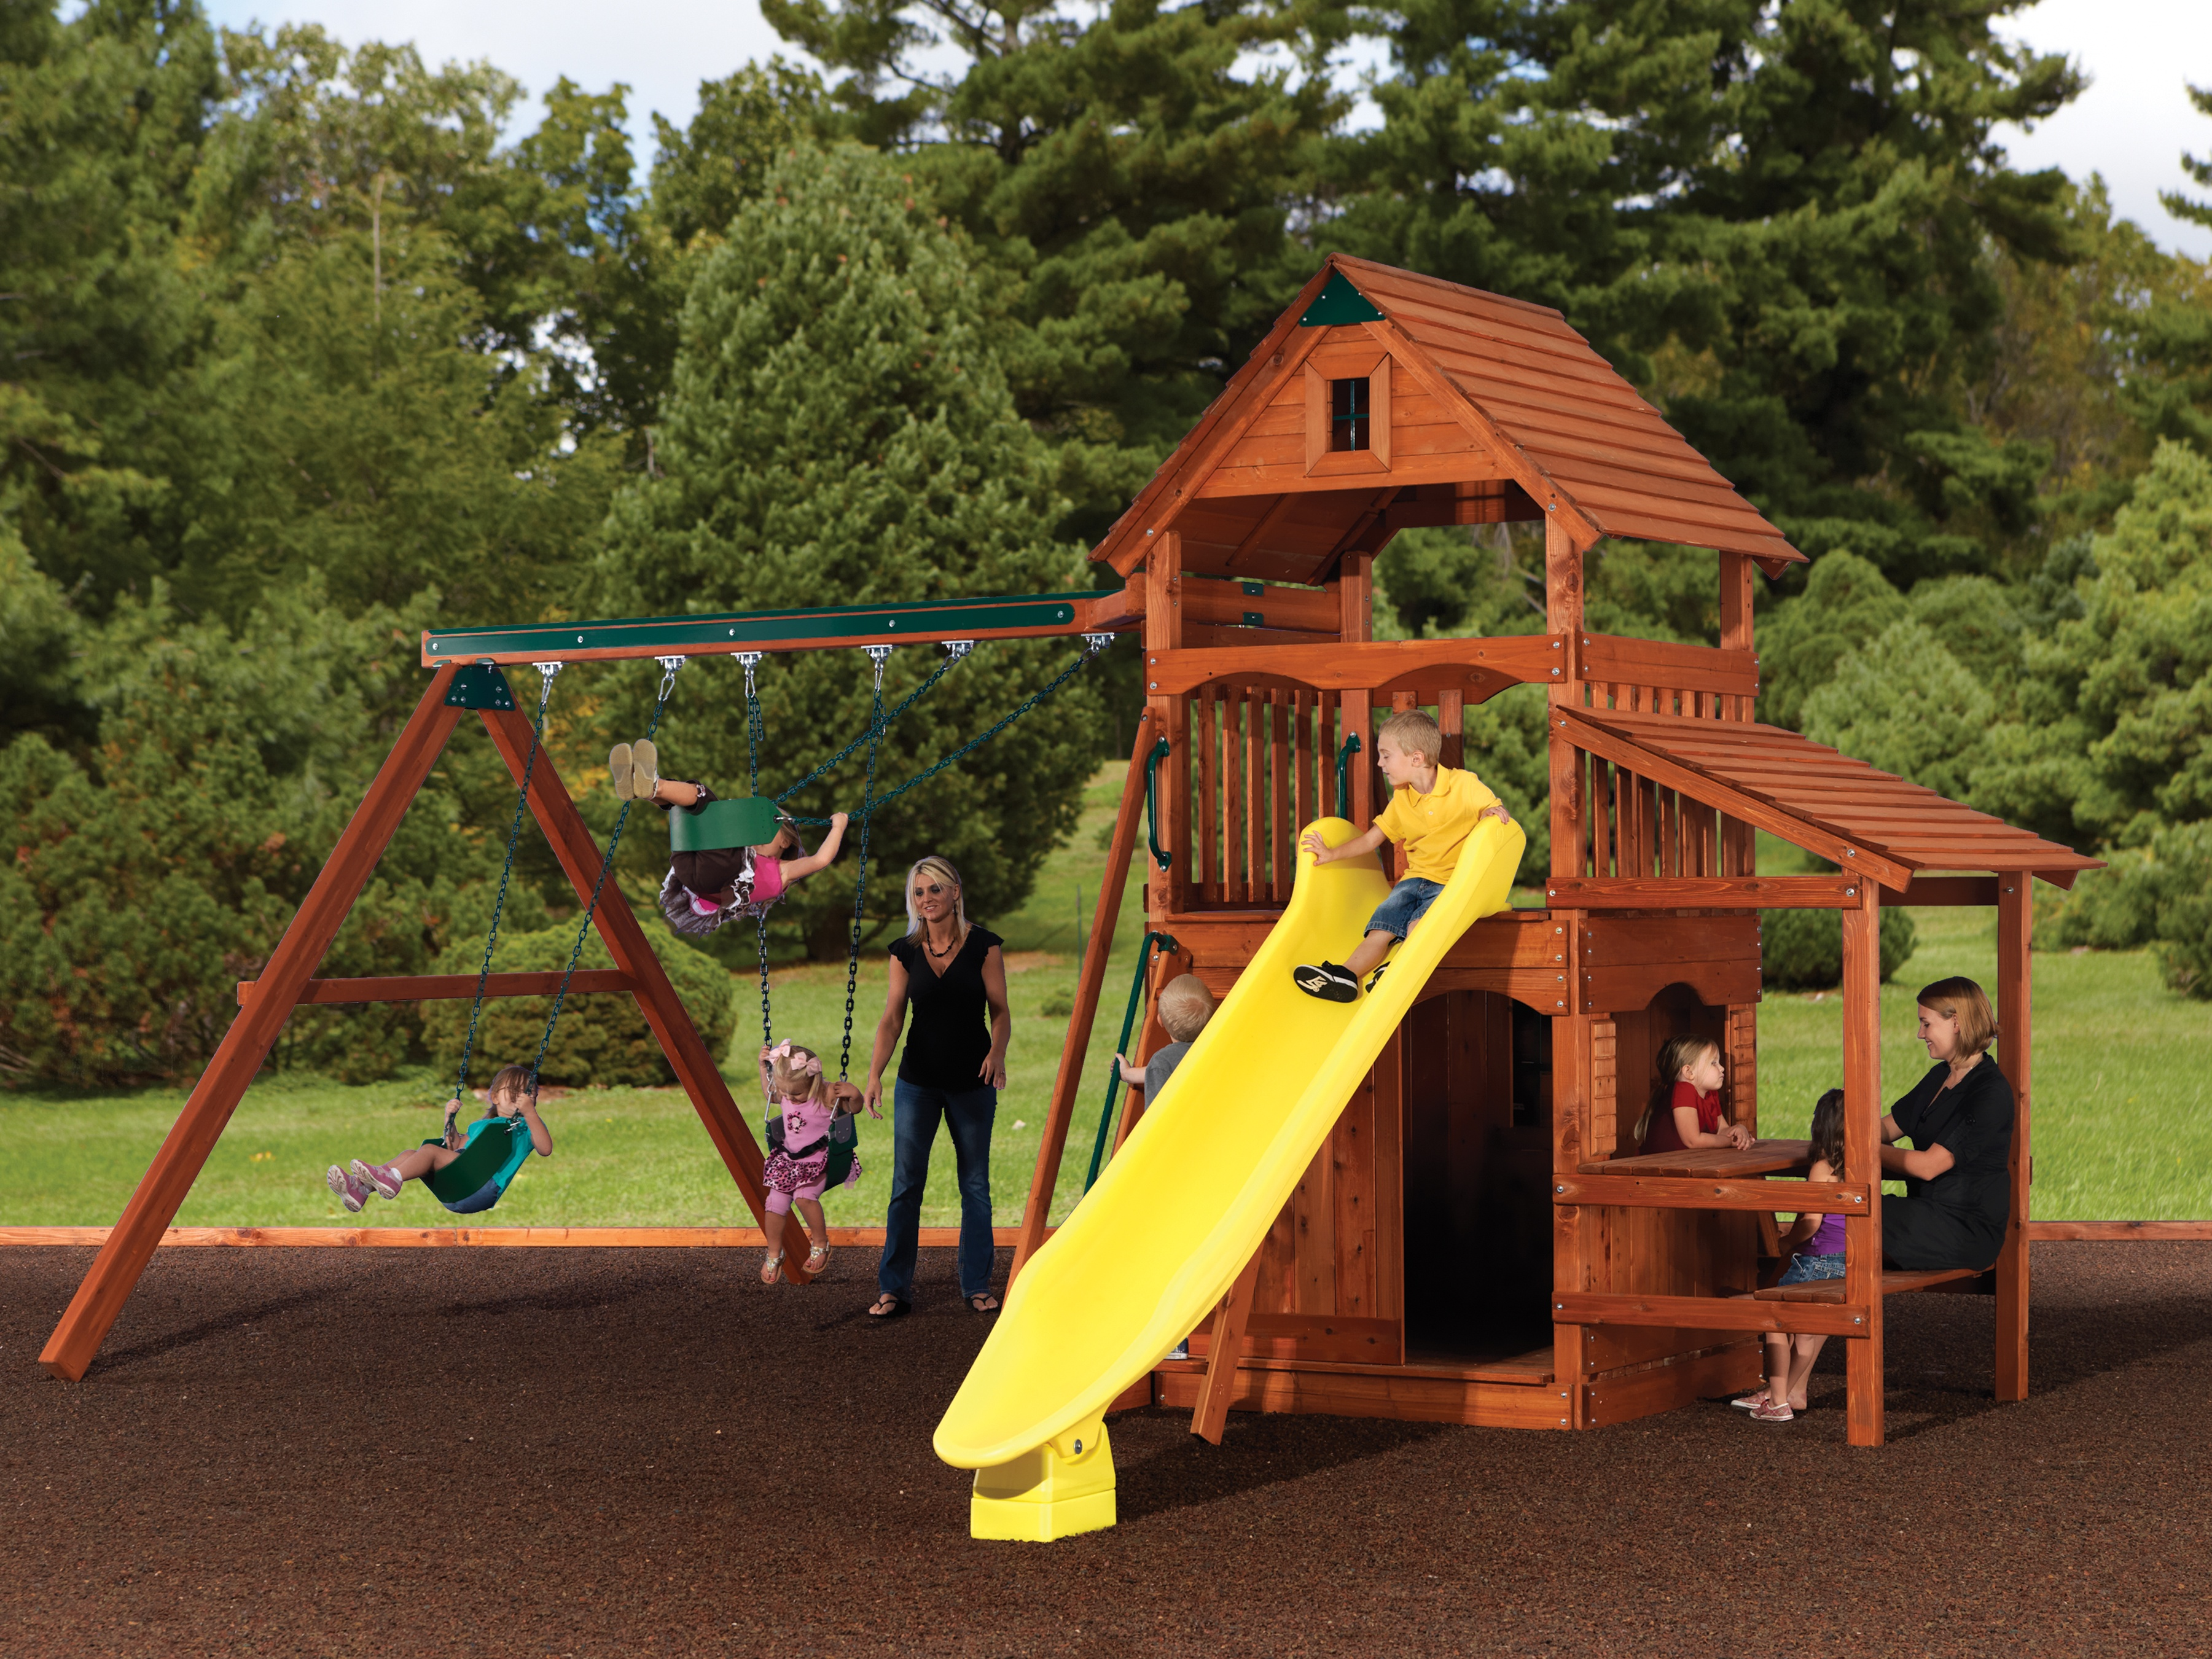 ... Backyard Adventure Idaho Playset Magellan 2 Playground ...